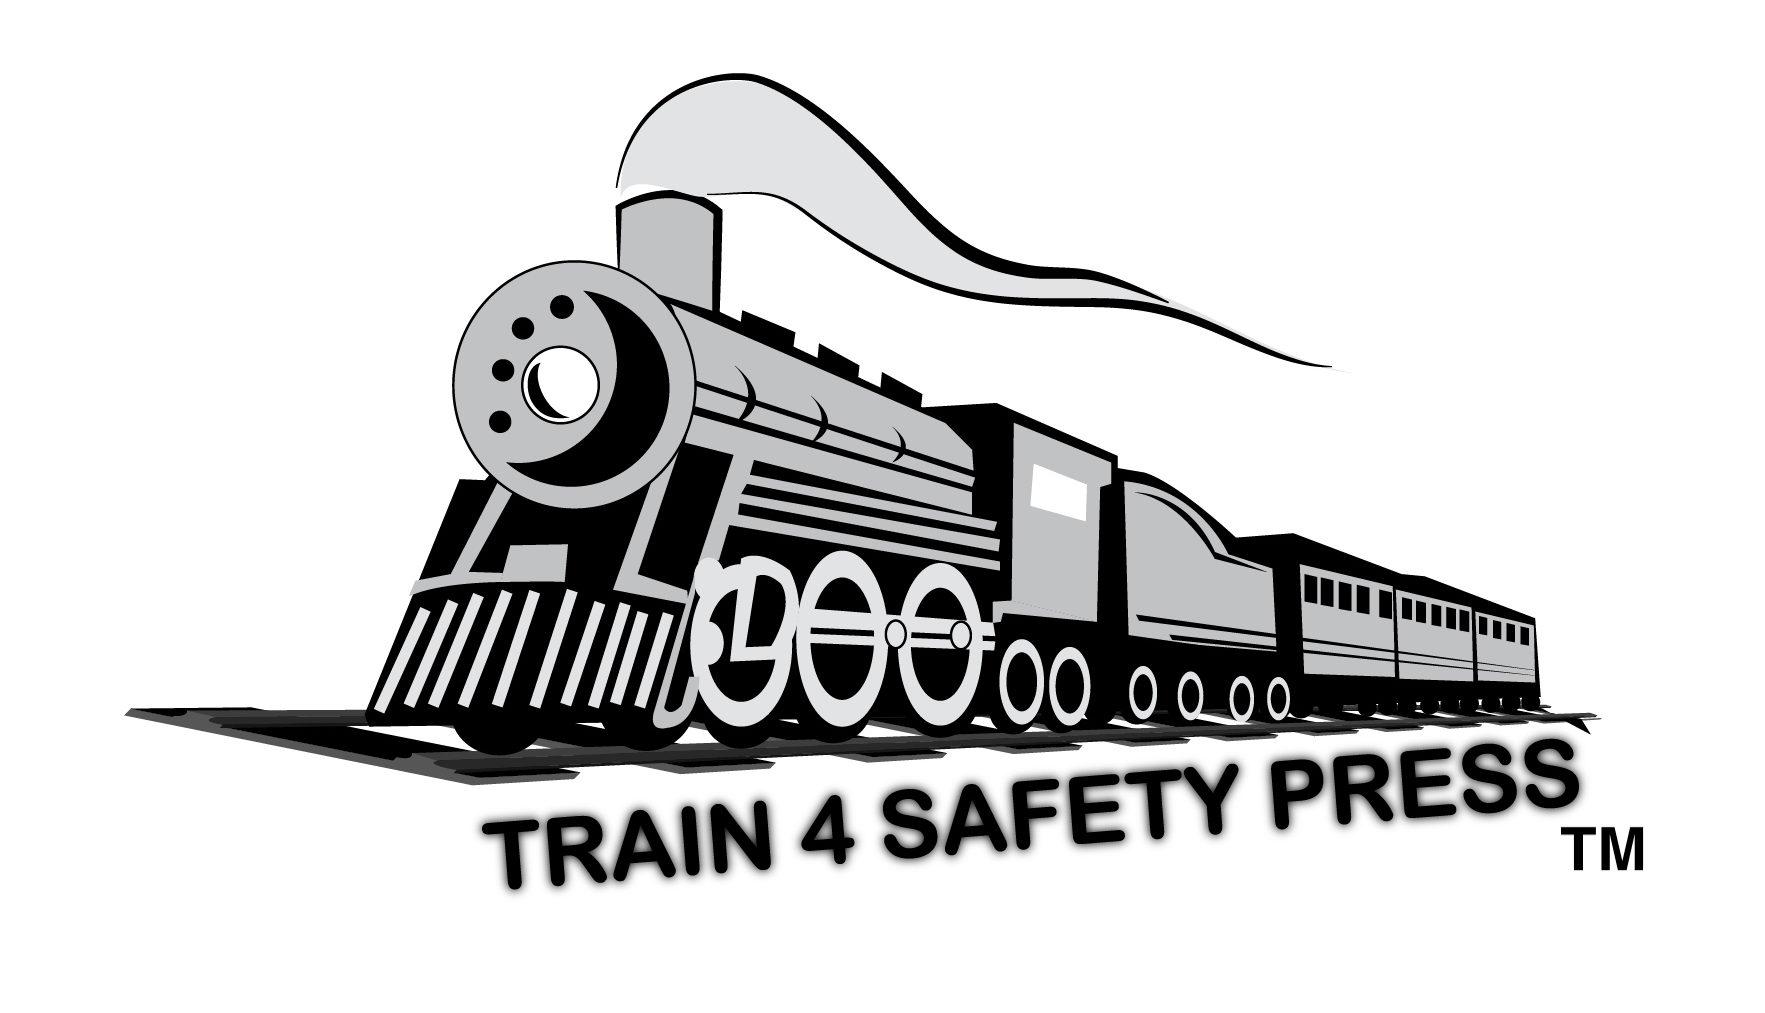 Train 4 Safety Press